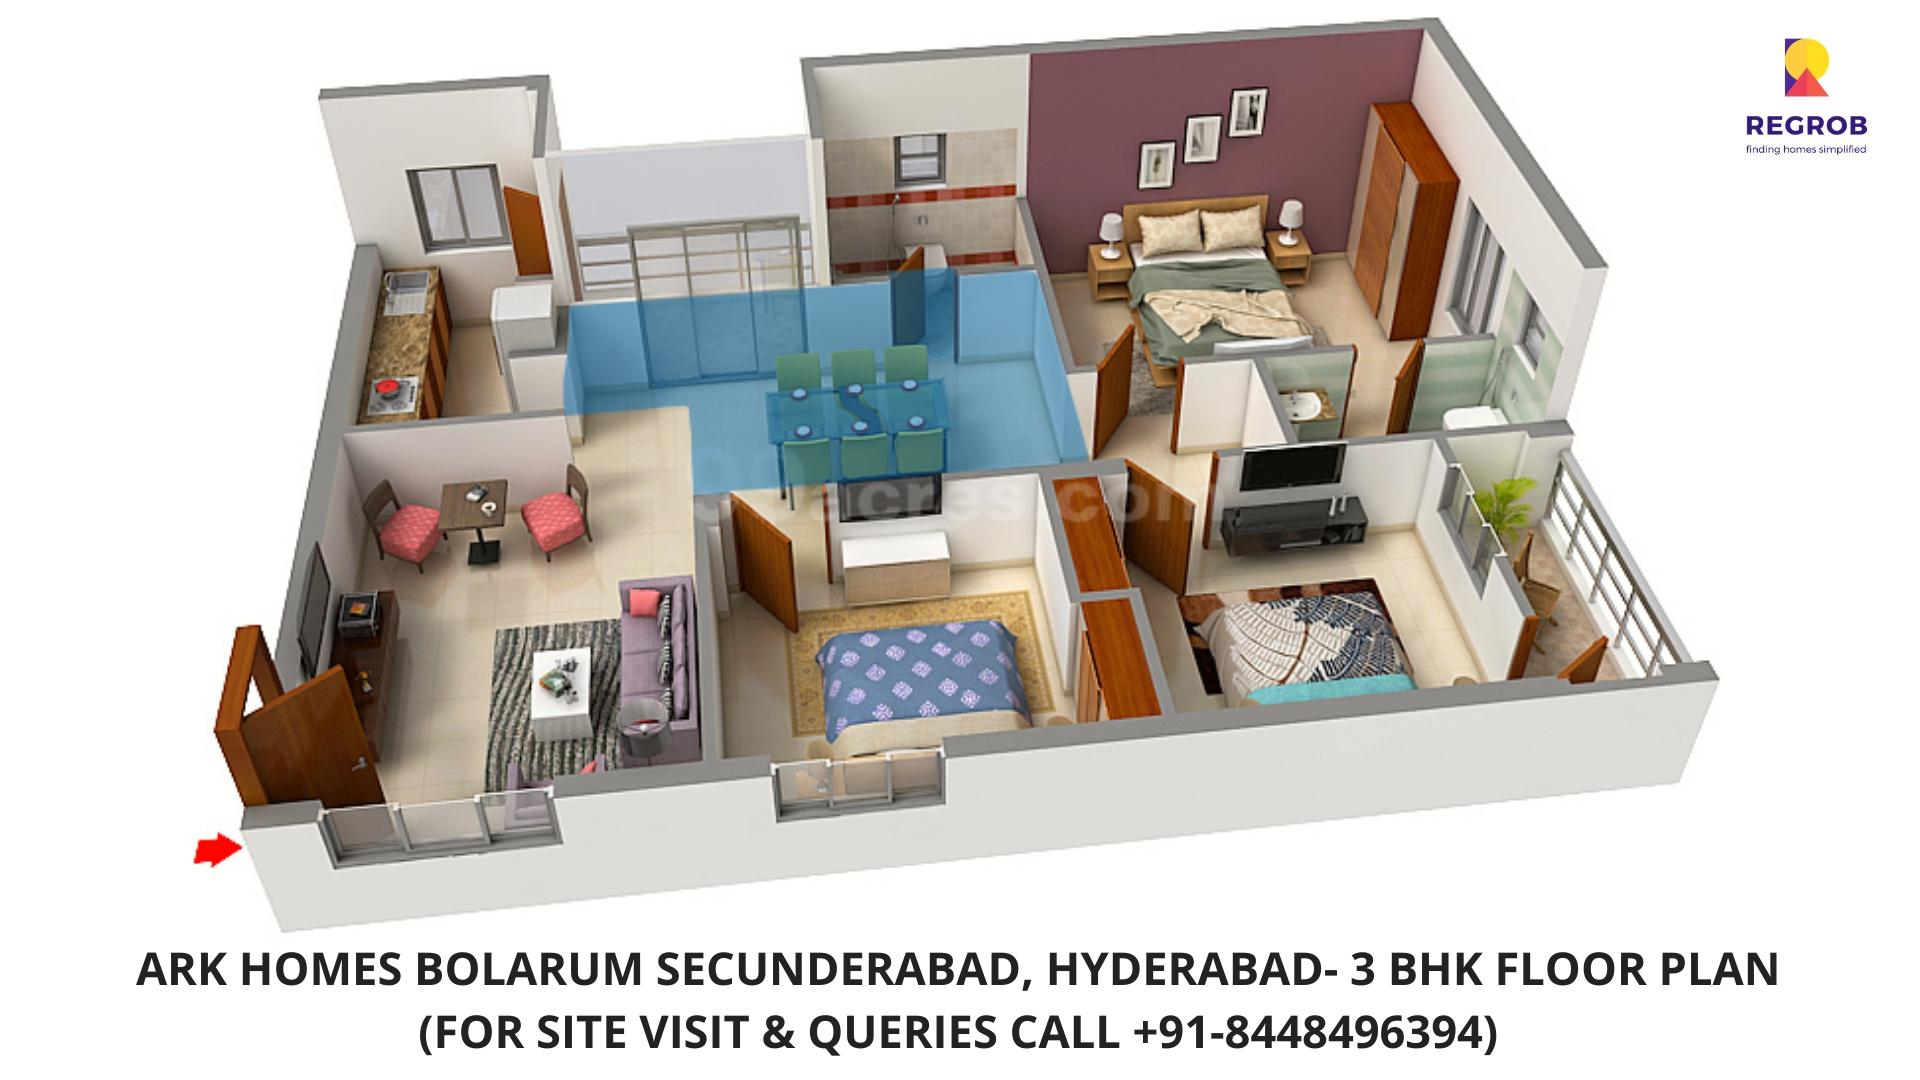 ARK Homes Bolarum, Secunderabad Hyderabad